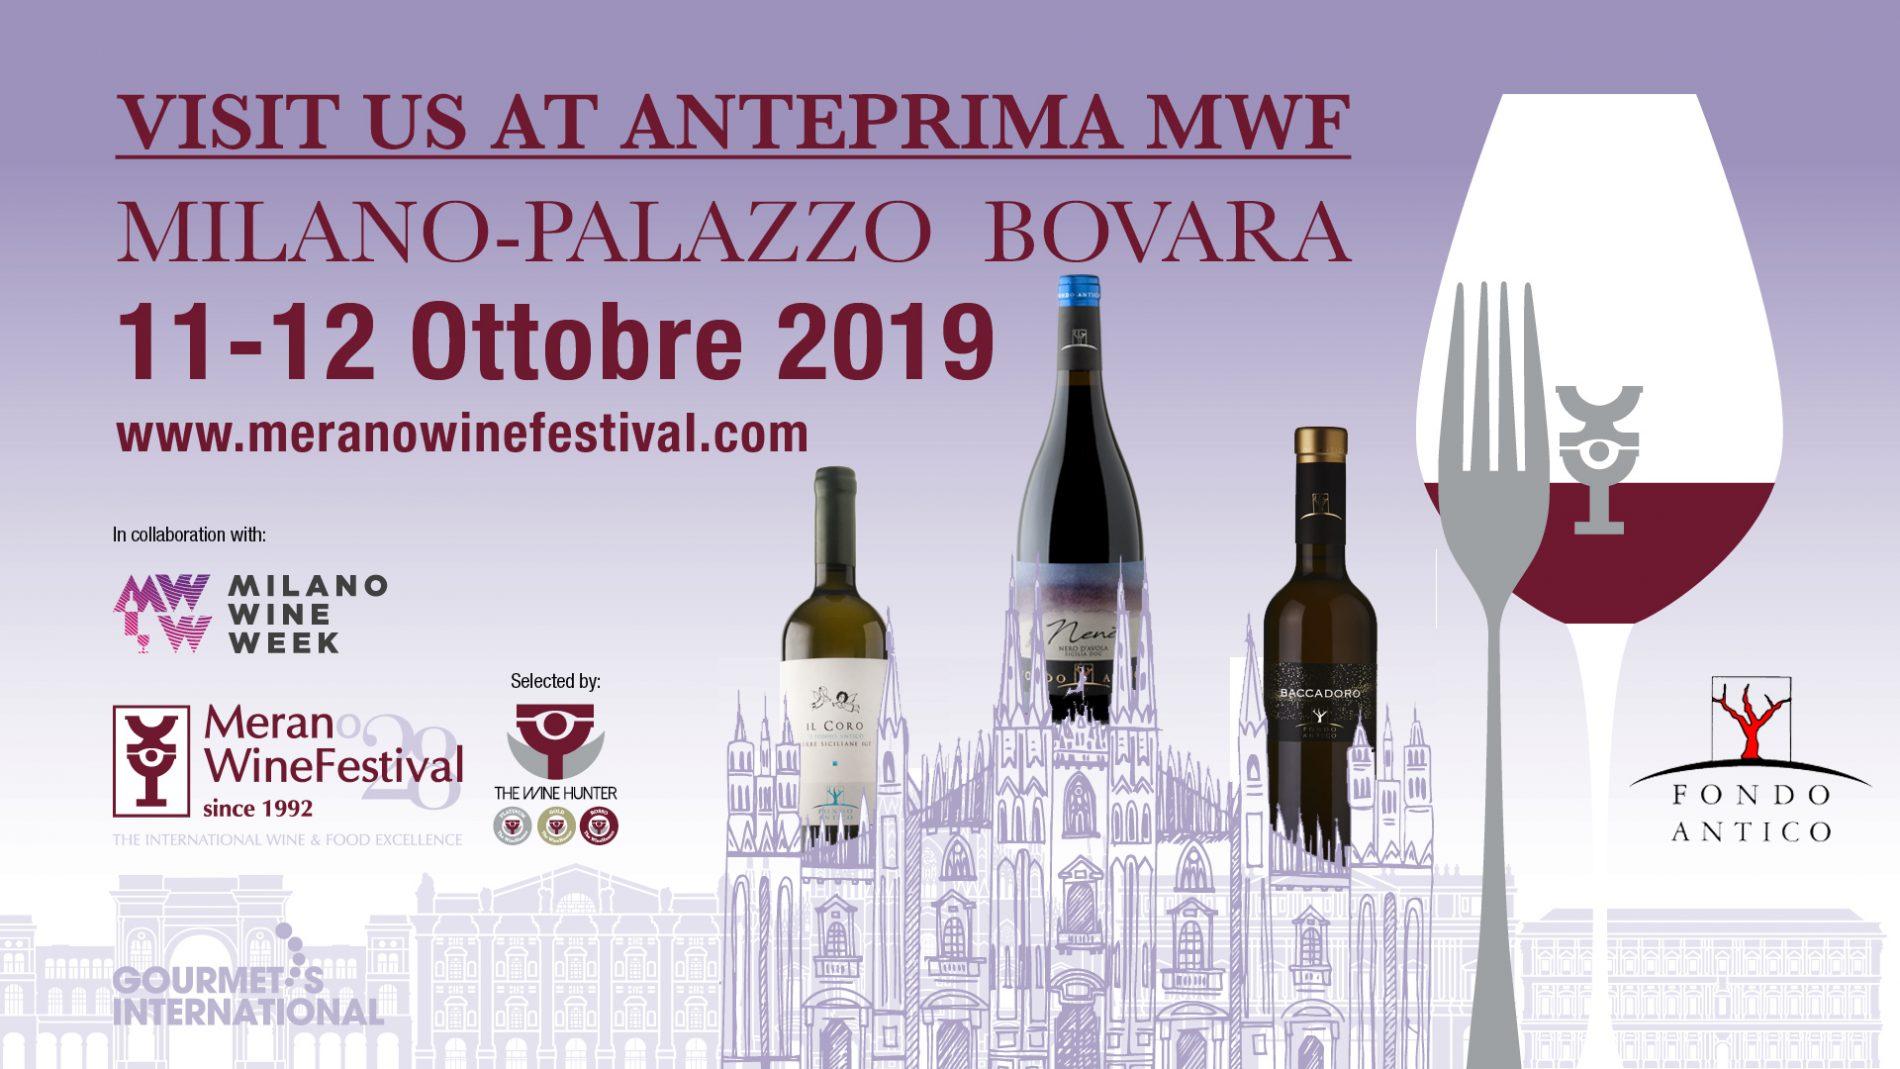 Anteprima MWF at Milano Wine Week – Milano